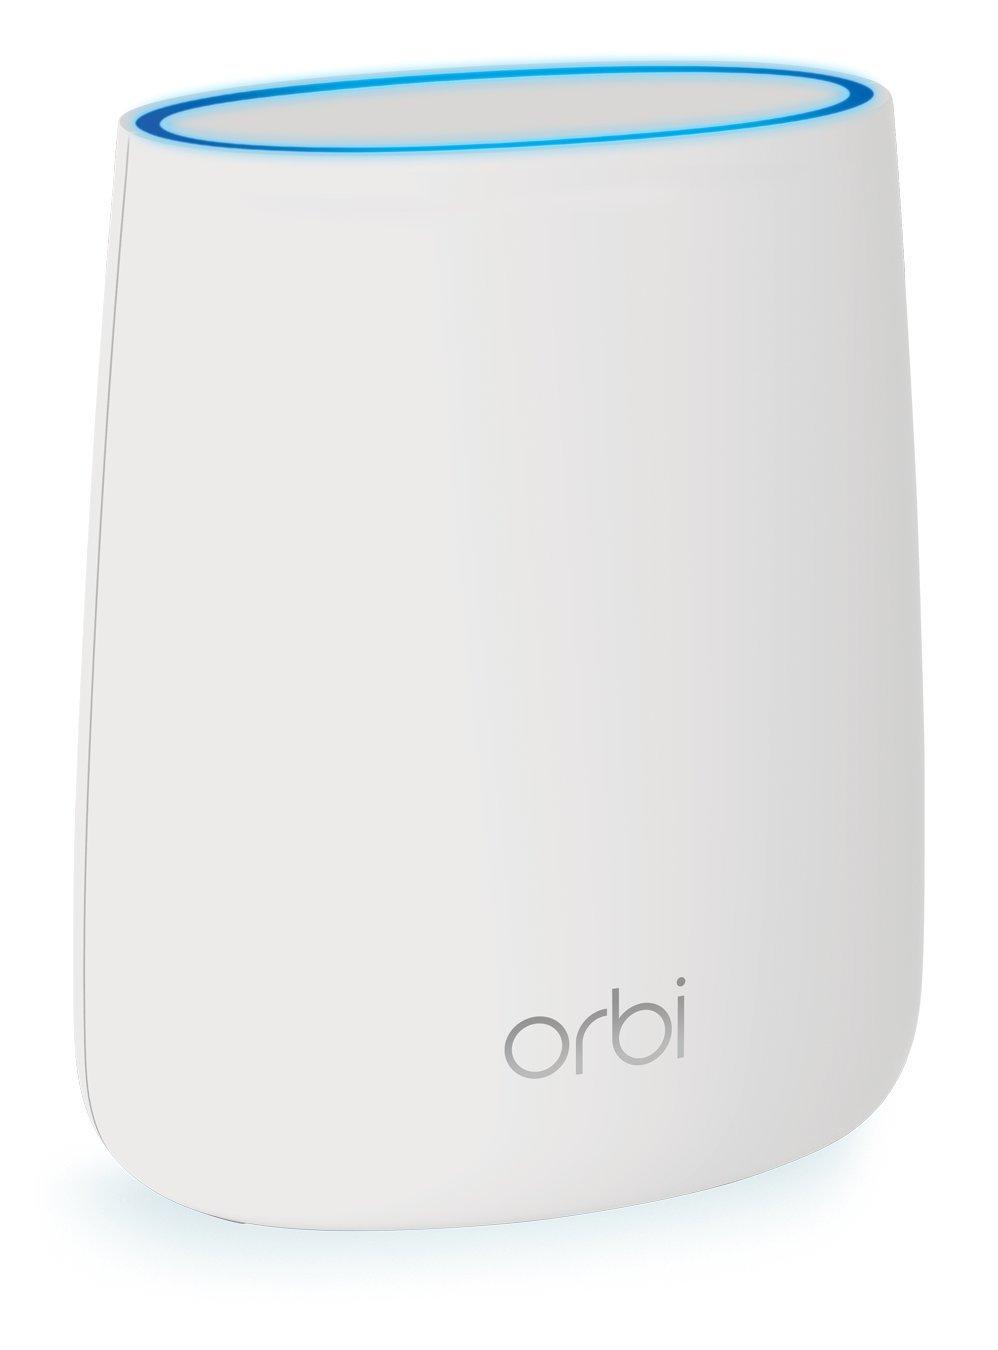 Netgear RBS20-100NAS AC2200 Tri-Band Wi-Fi Coverage Orbi Whole Home Satellite by NETGEAR